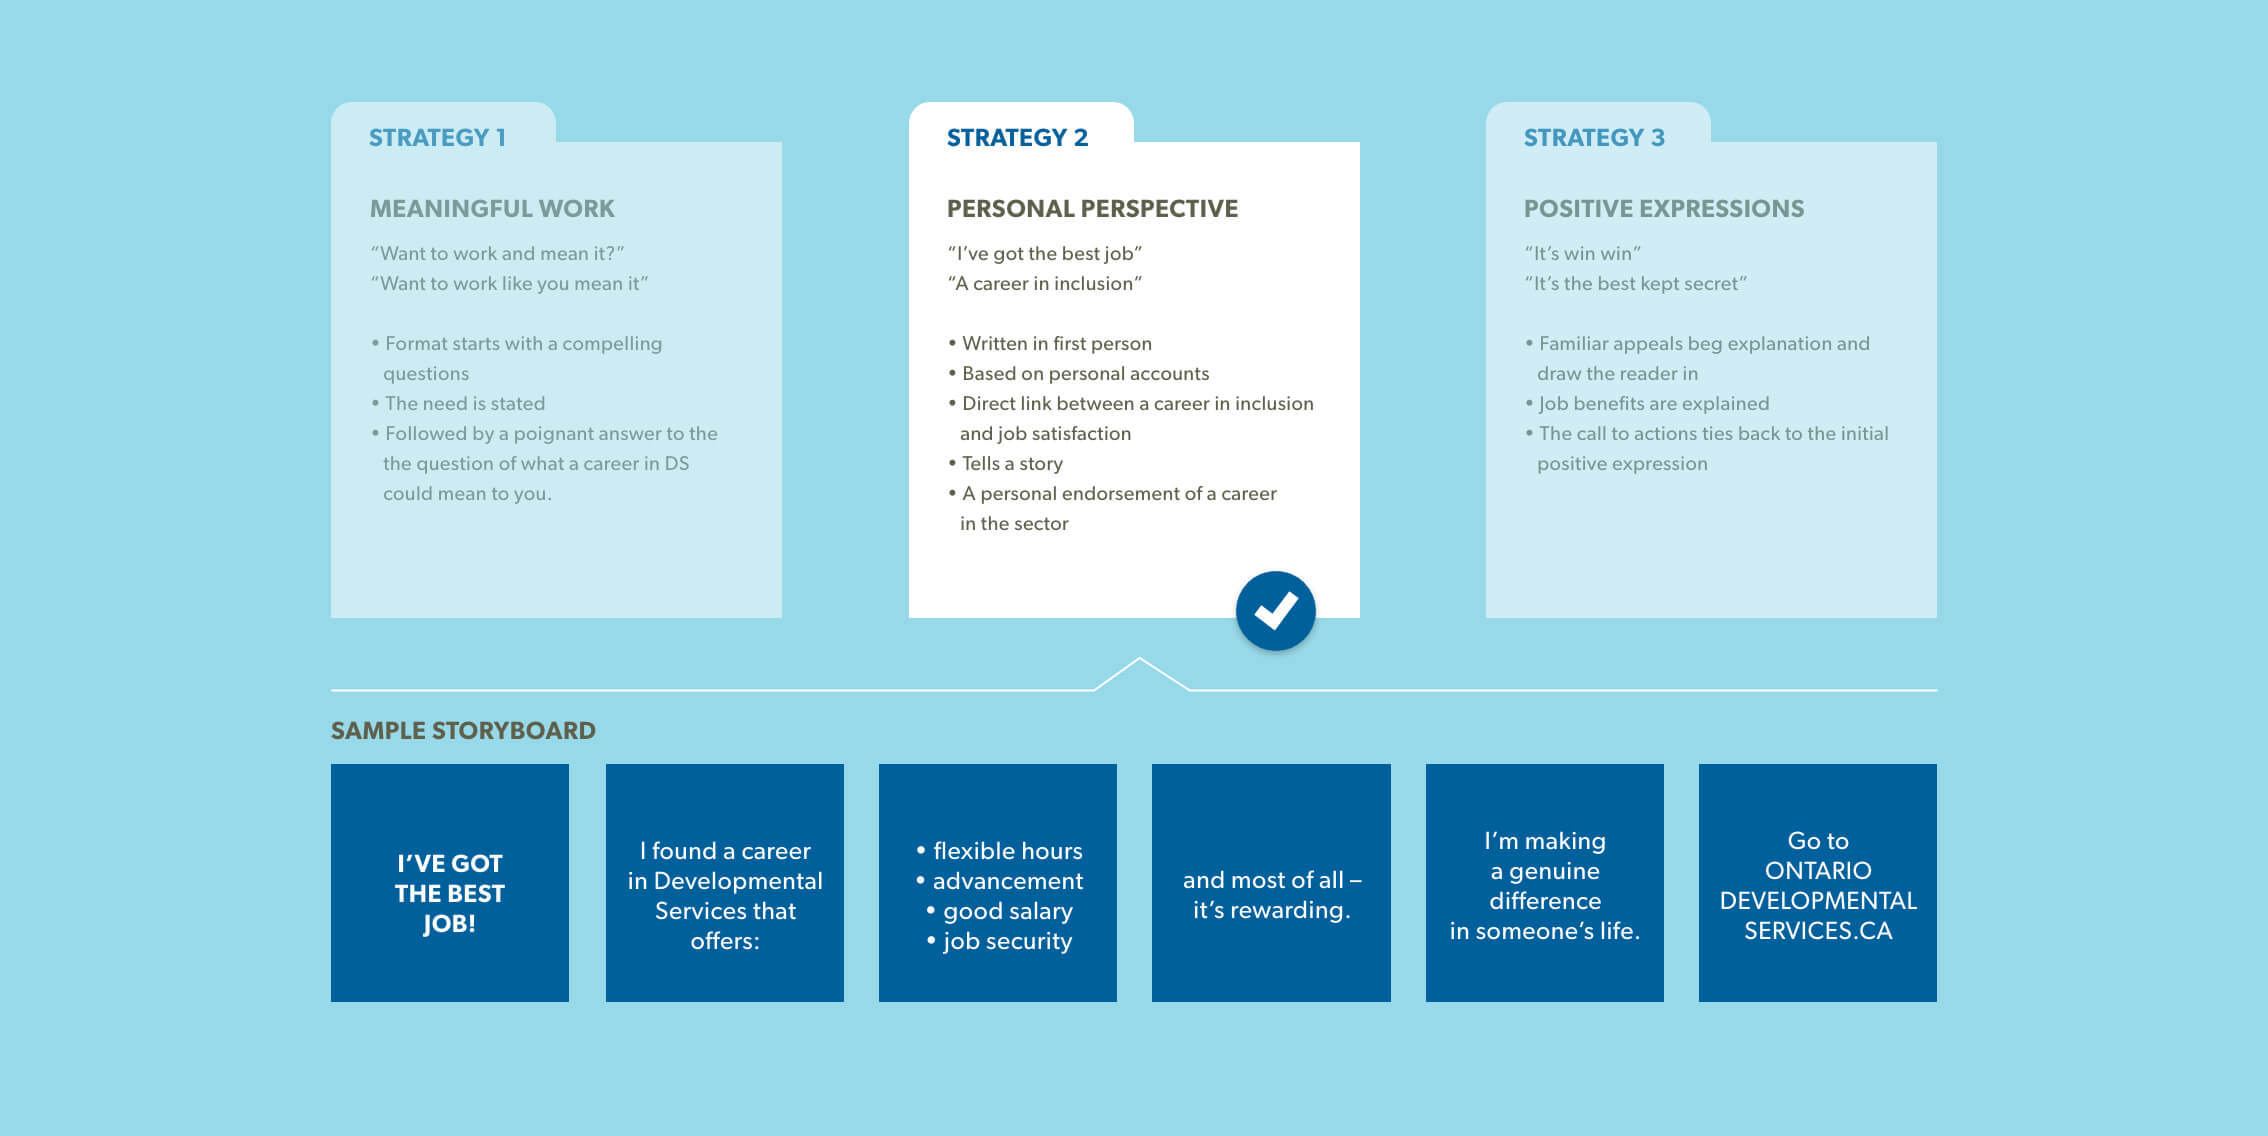 Diagram of strategic process for DSHRS #bestjobontario campaign